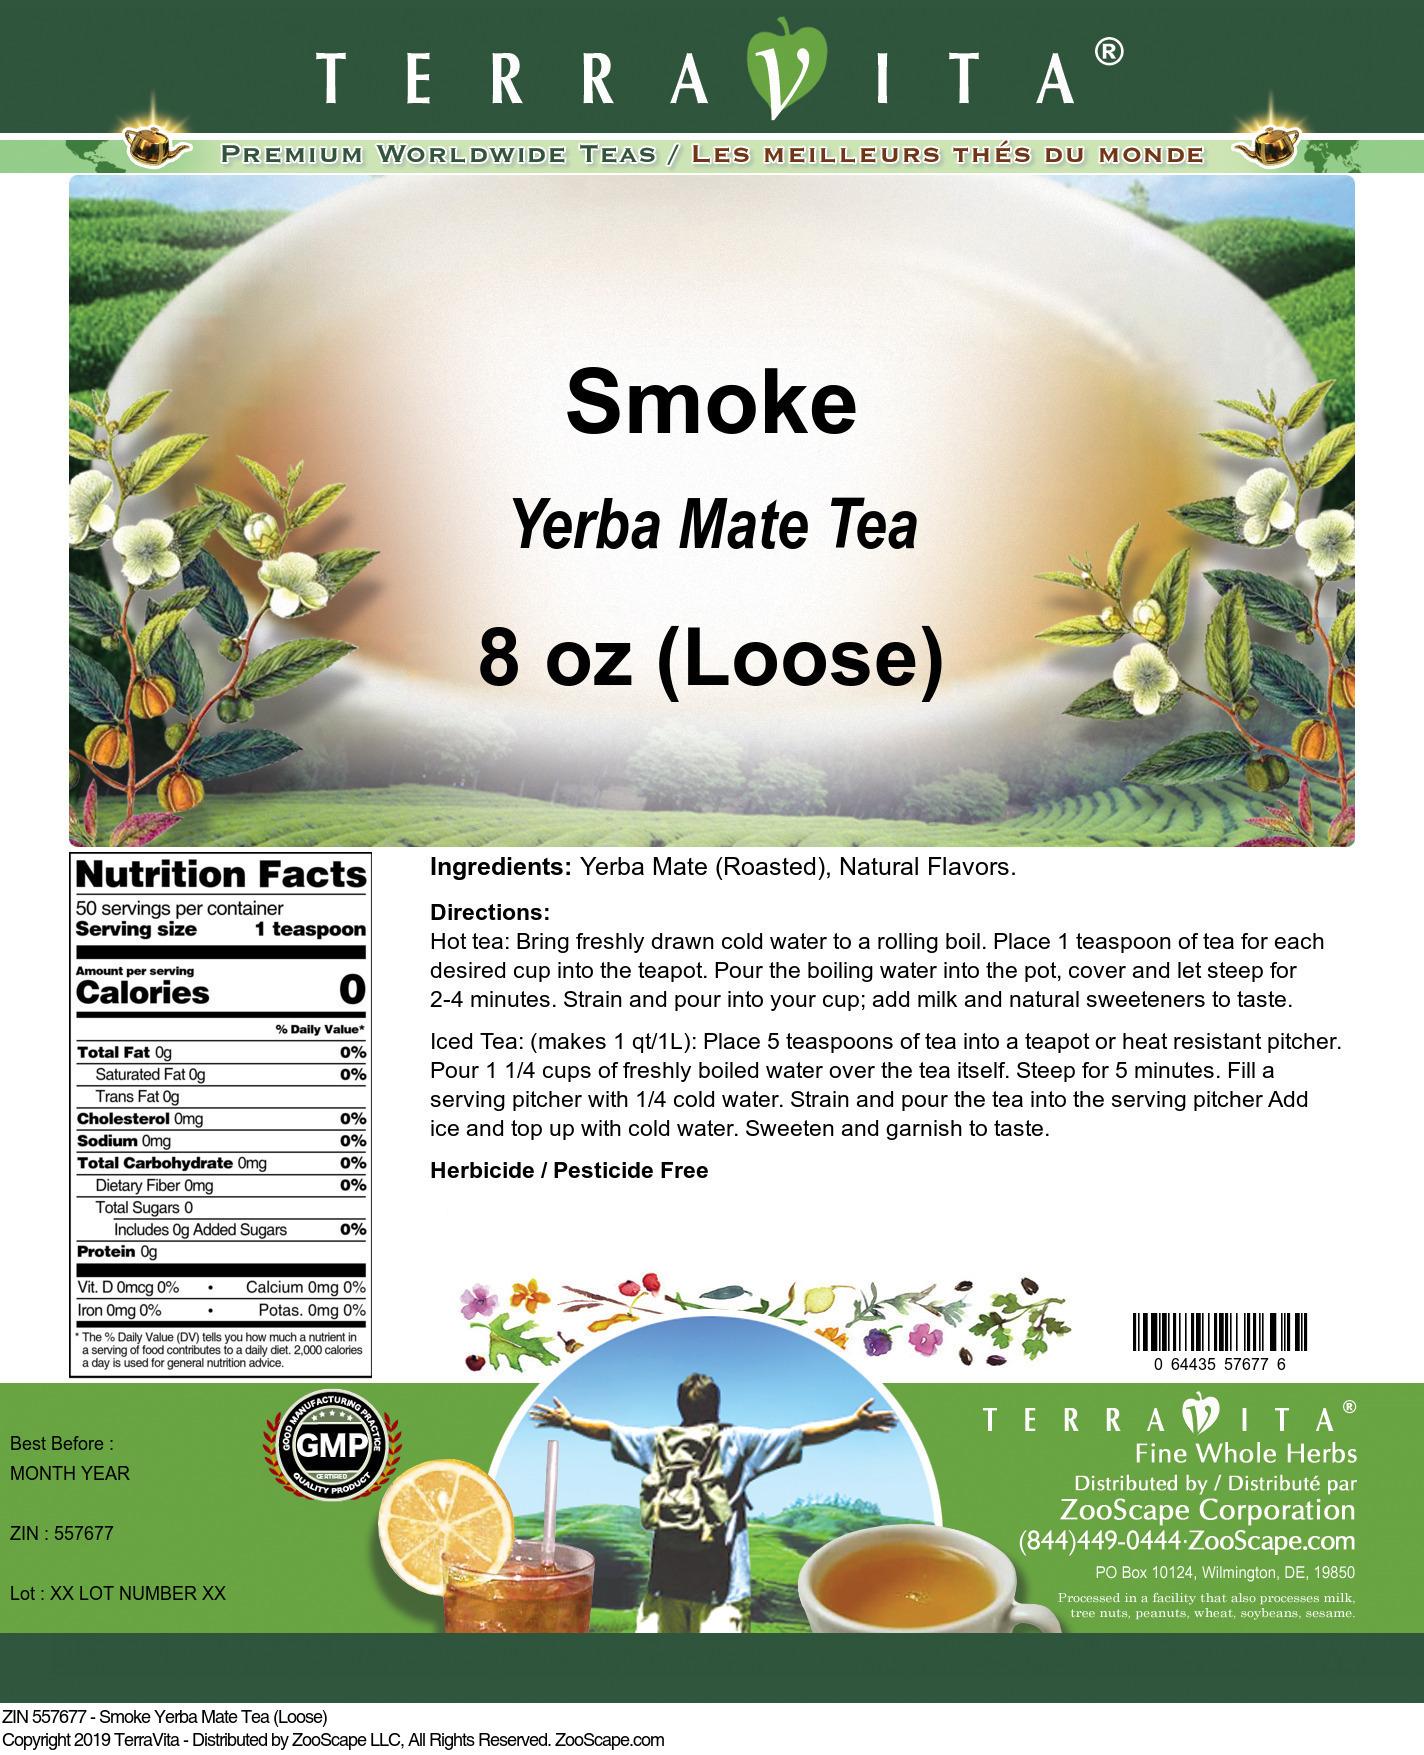 Smoke Yerba Mate Tea (Loose)